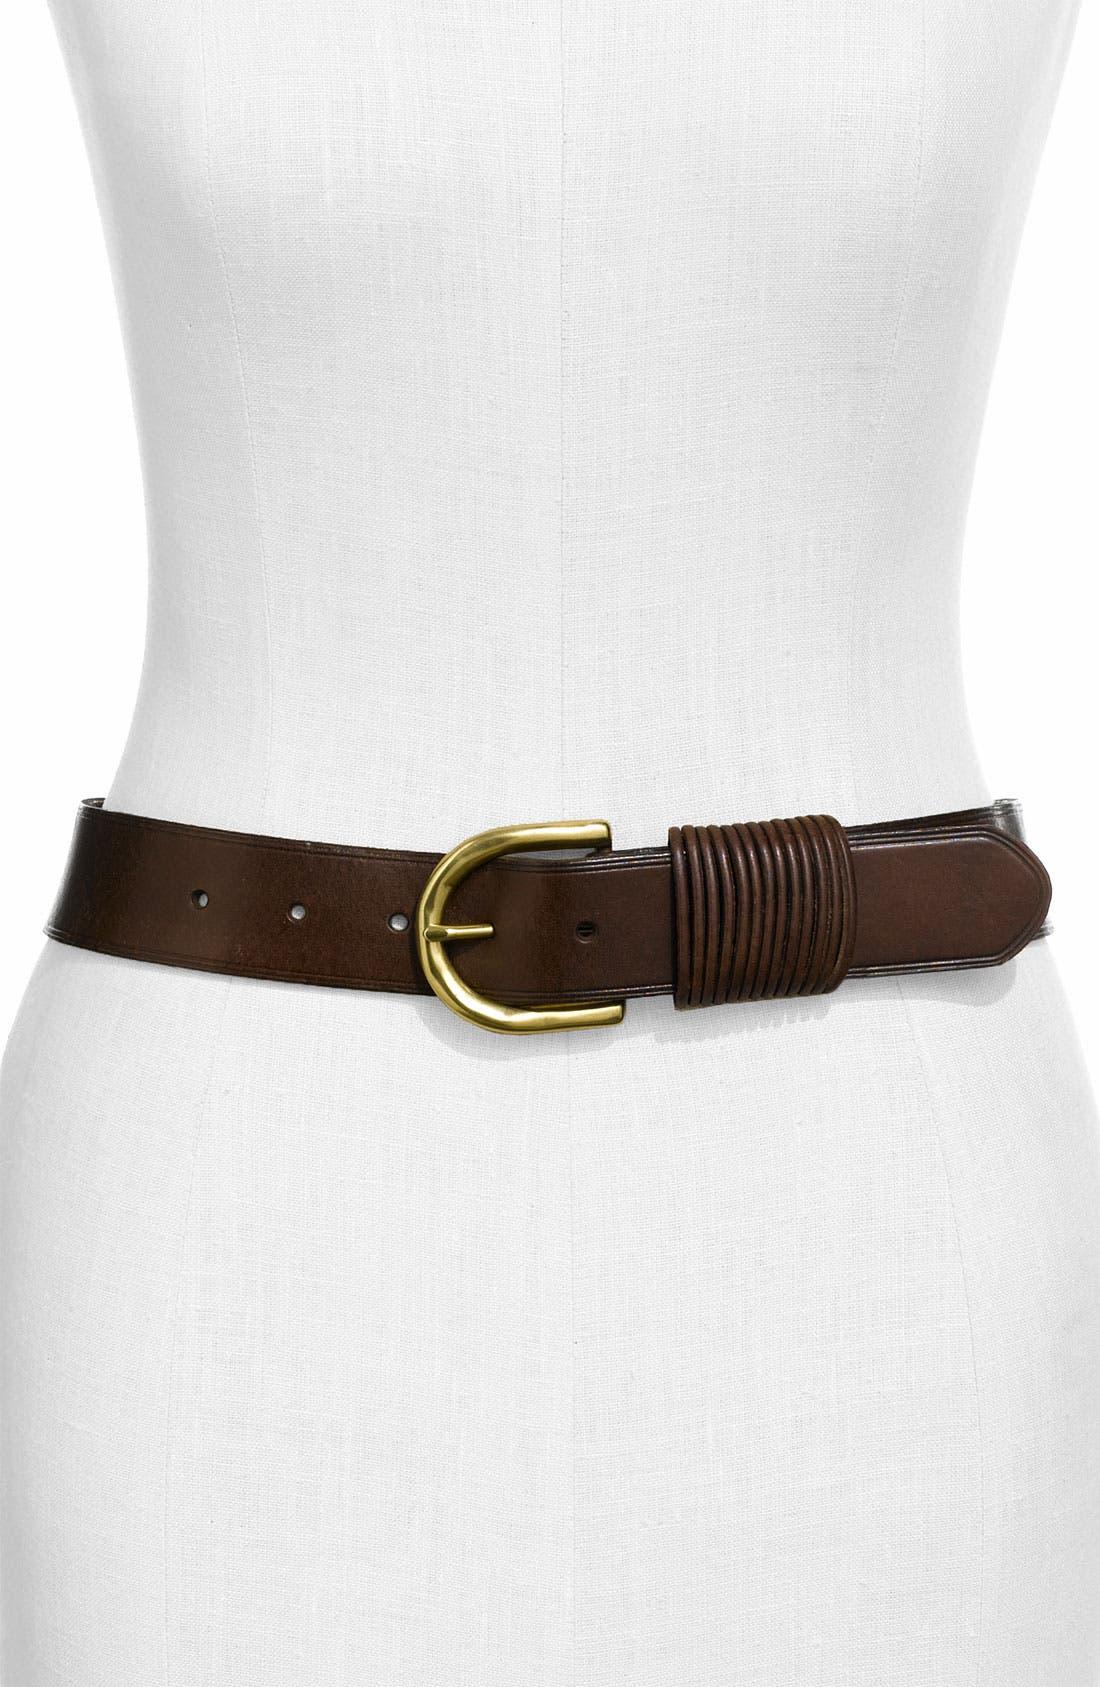 Main Image - Lauren Ralph Lauren Vegetable Tanned Leather Belt